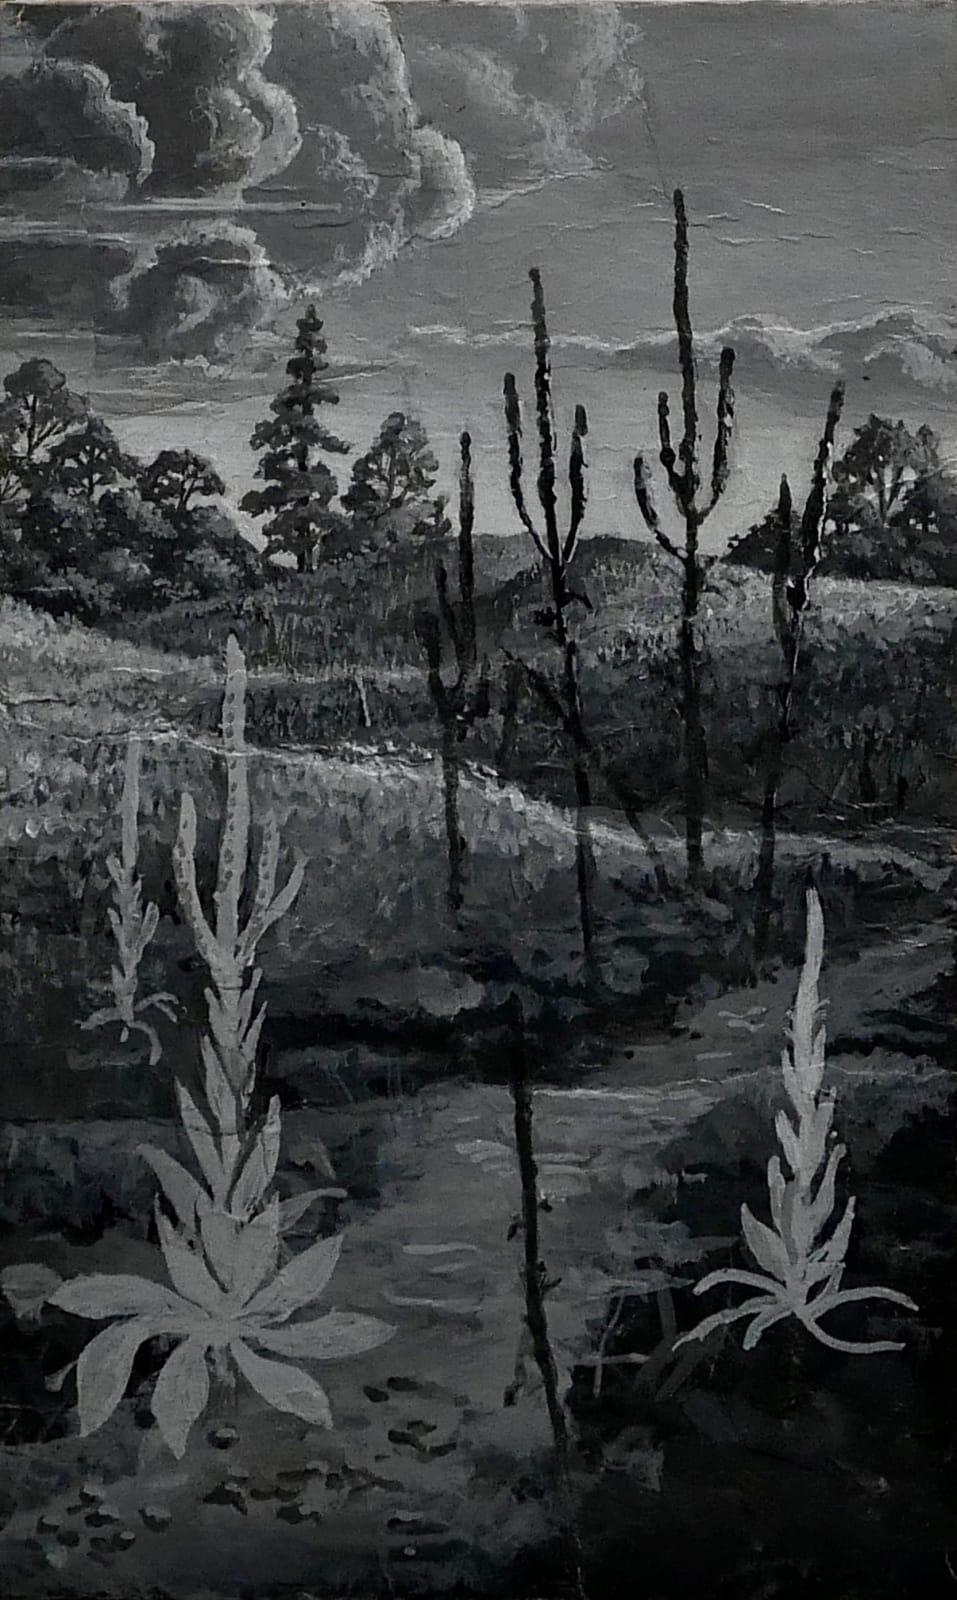 Trail through hilltop Mullein grove 1970s Gouache on paper 6 1/2 x 4 in. (RK 69) $5,000